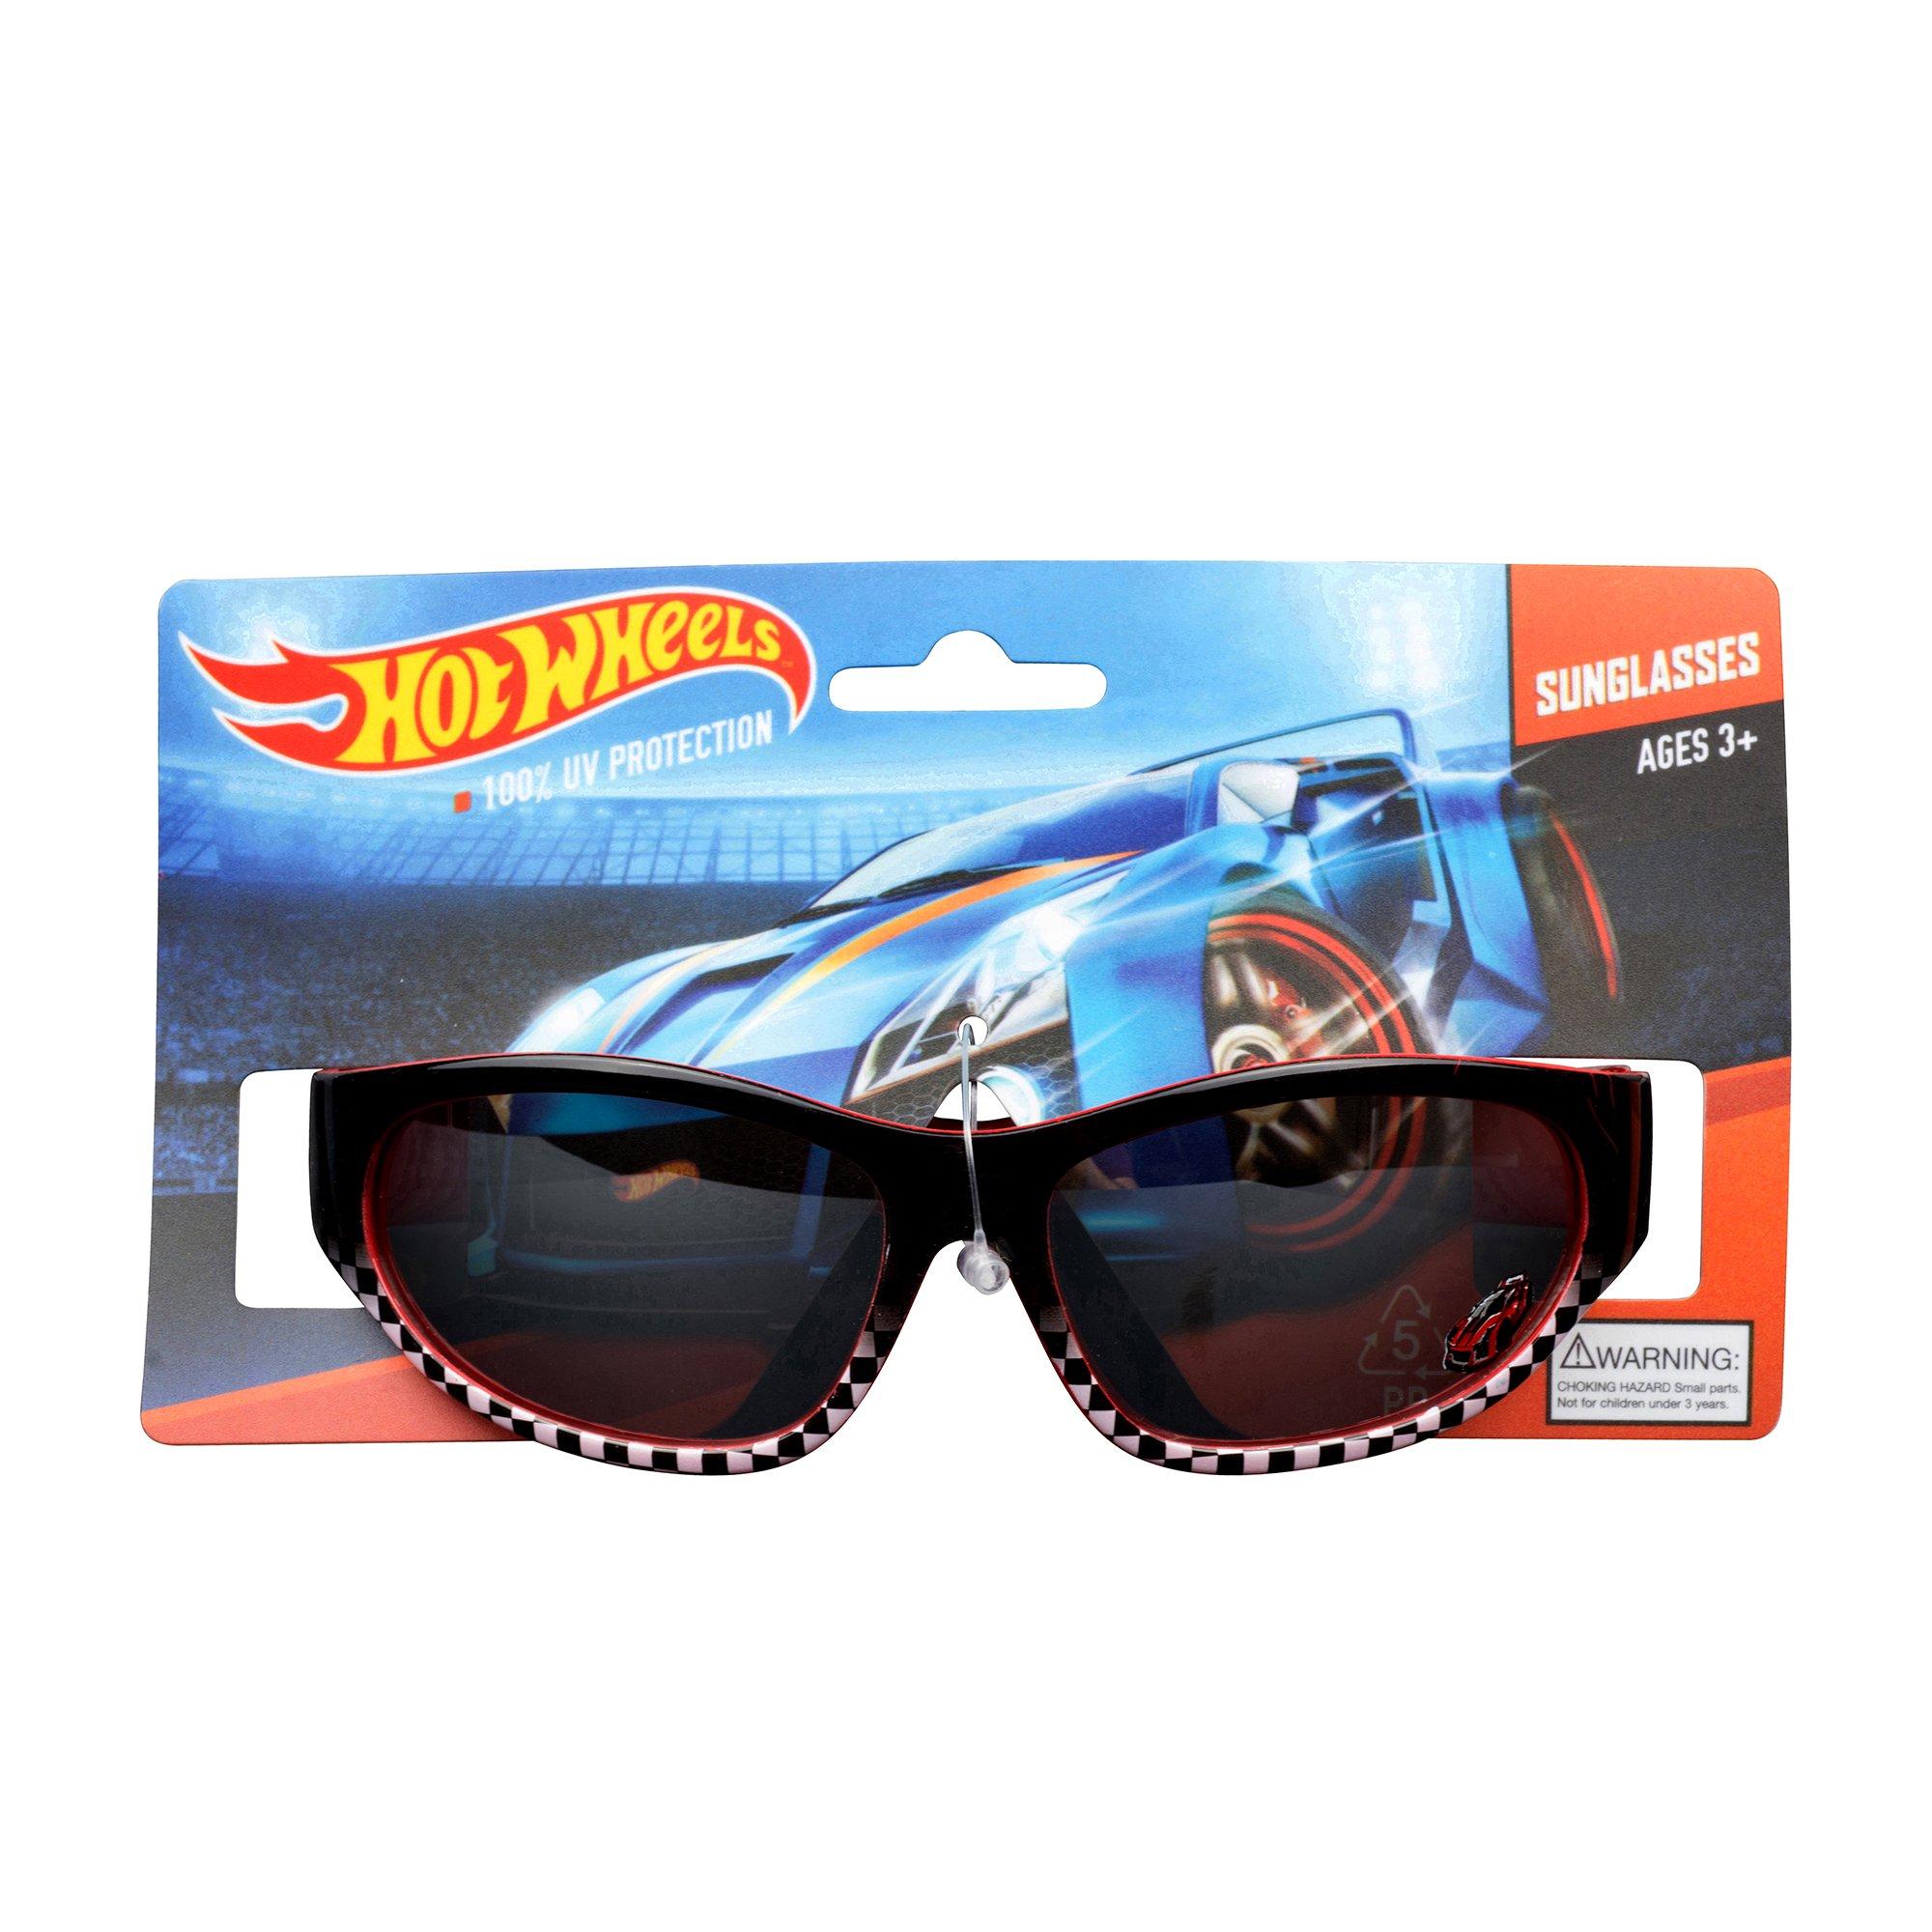 KIDS SUNGLASSES- BOYS 100% UV SUNGLASSES, CARS, MICKEY PAW PATROL, HOT WHEELS, PJ MASK